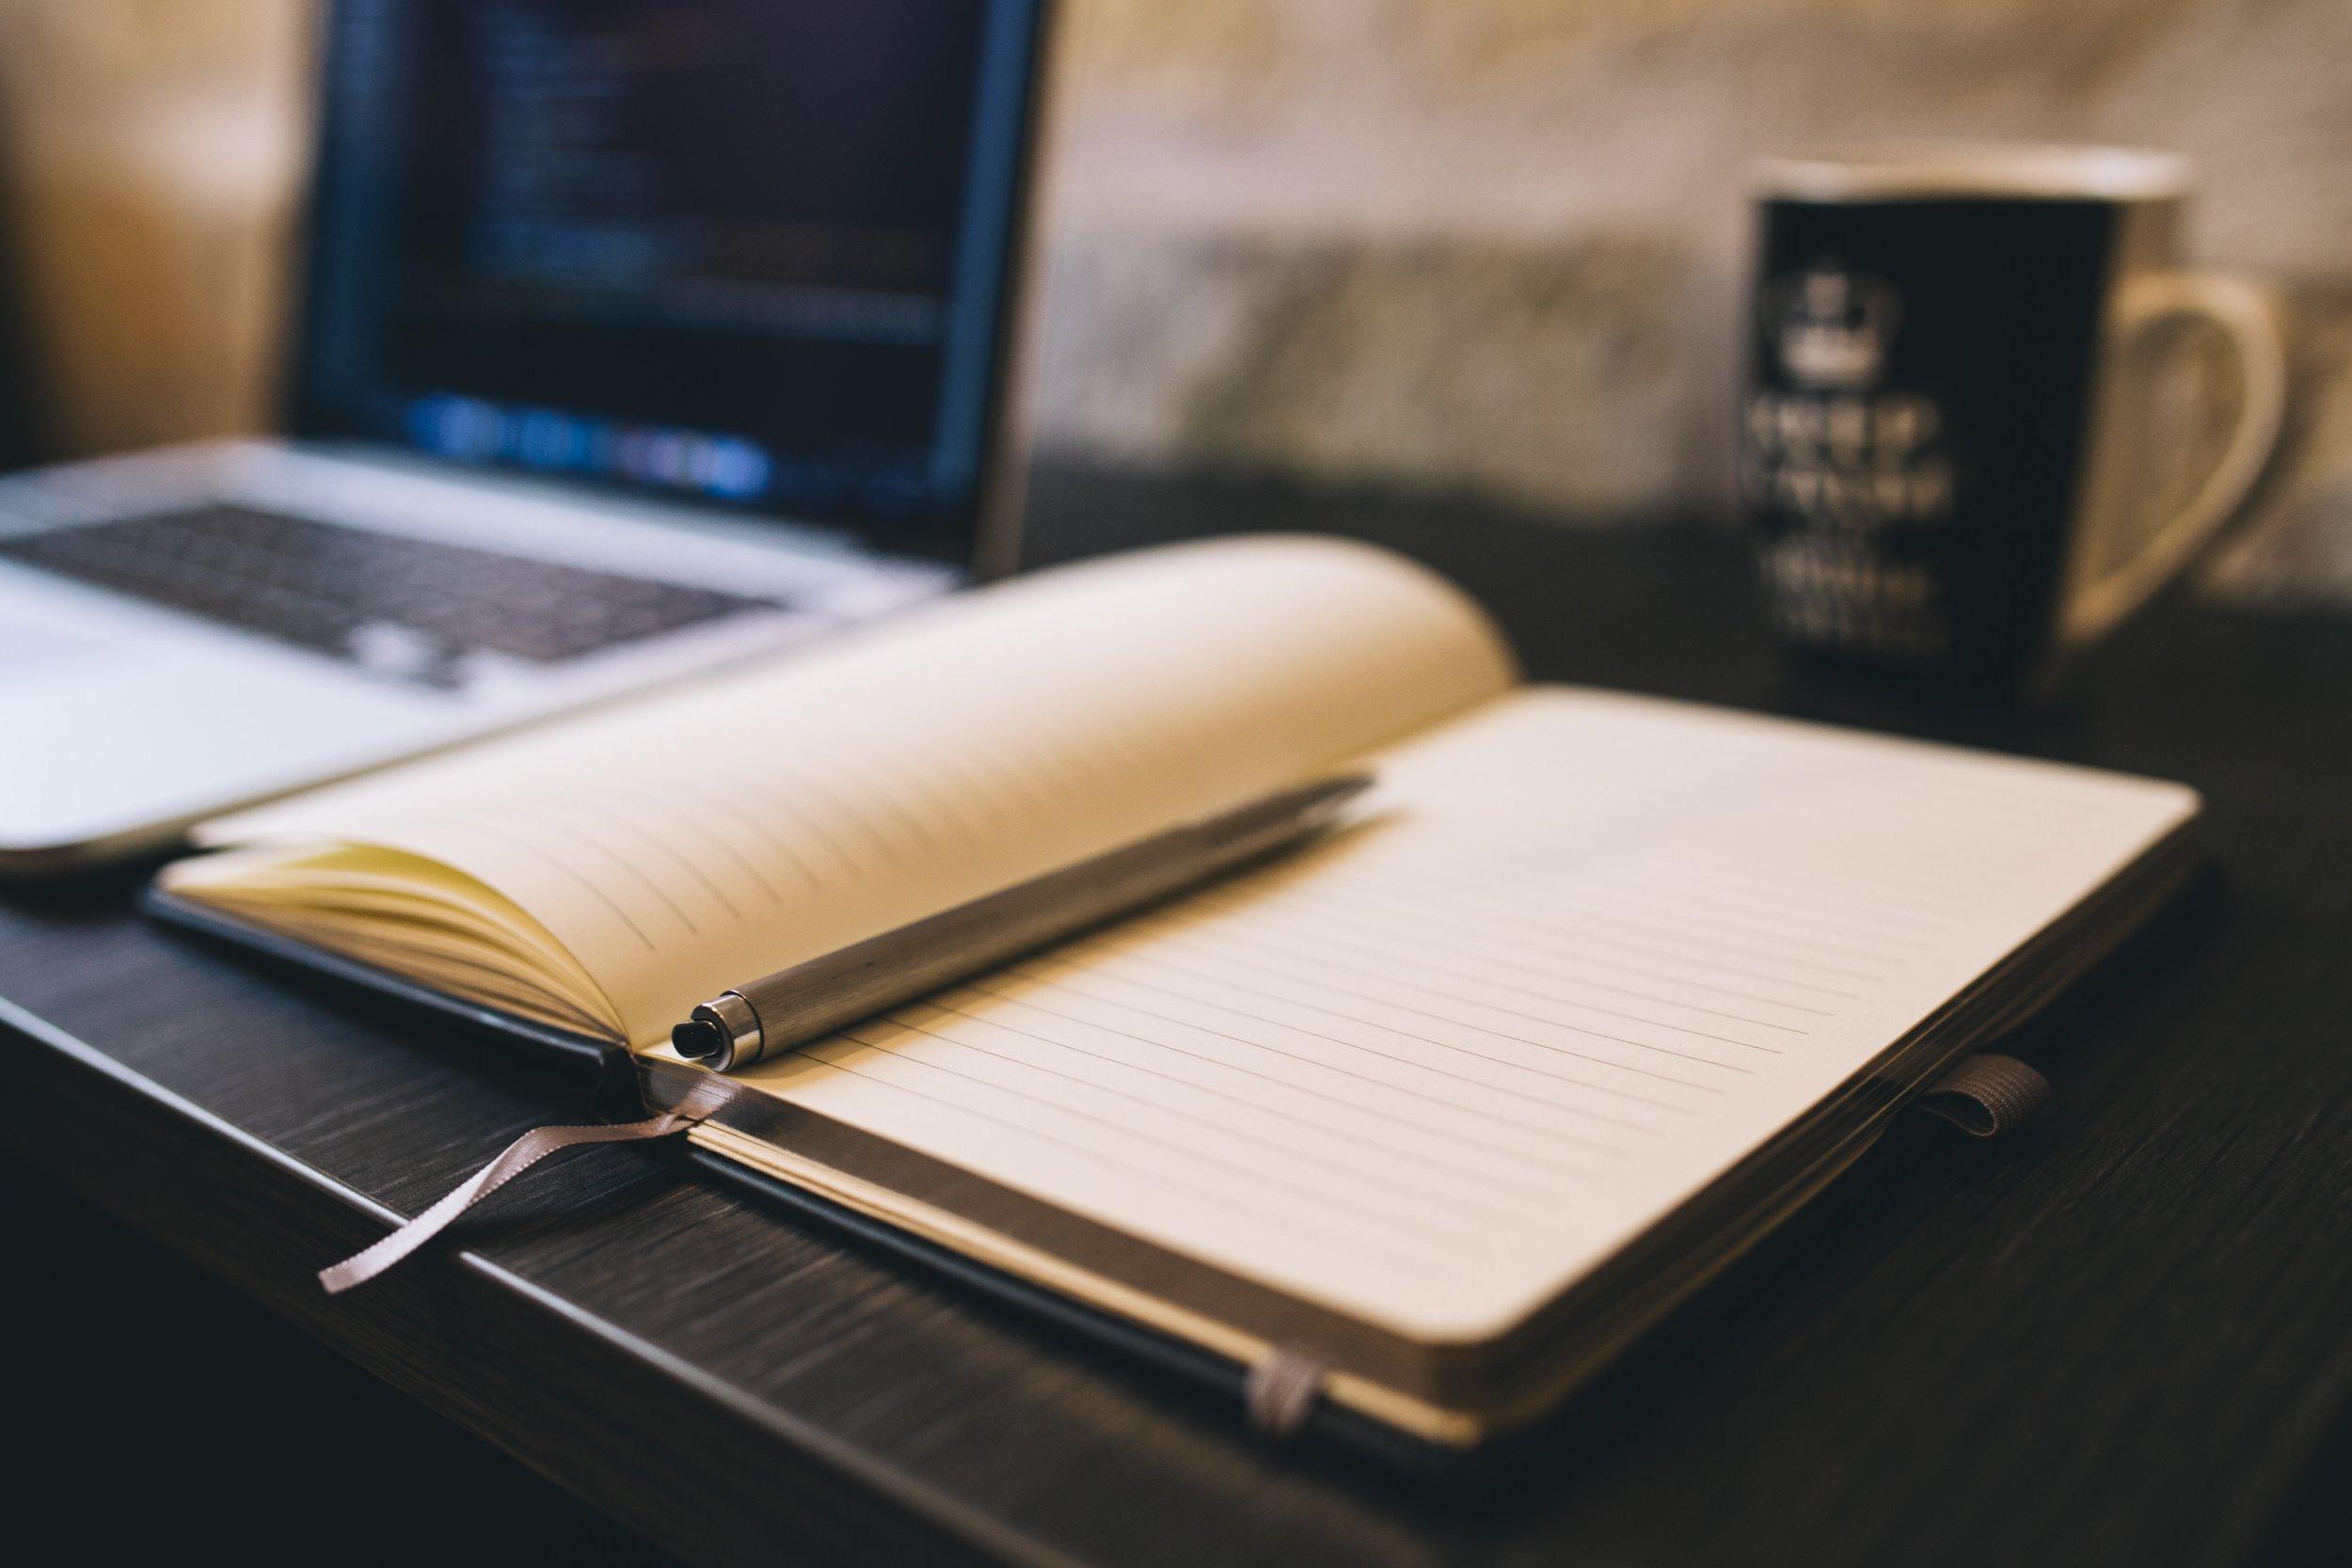 blogging-coffee-copywriting-34601.jpg